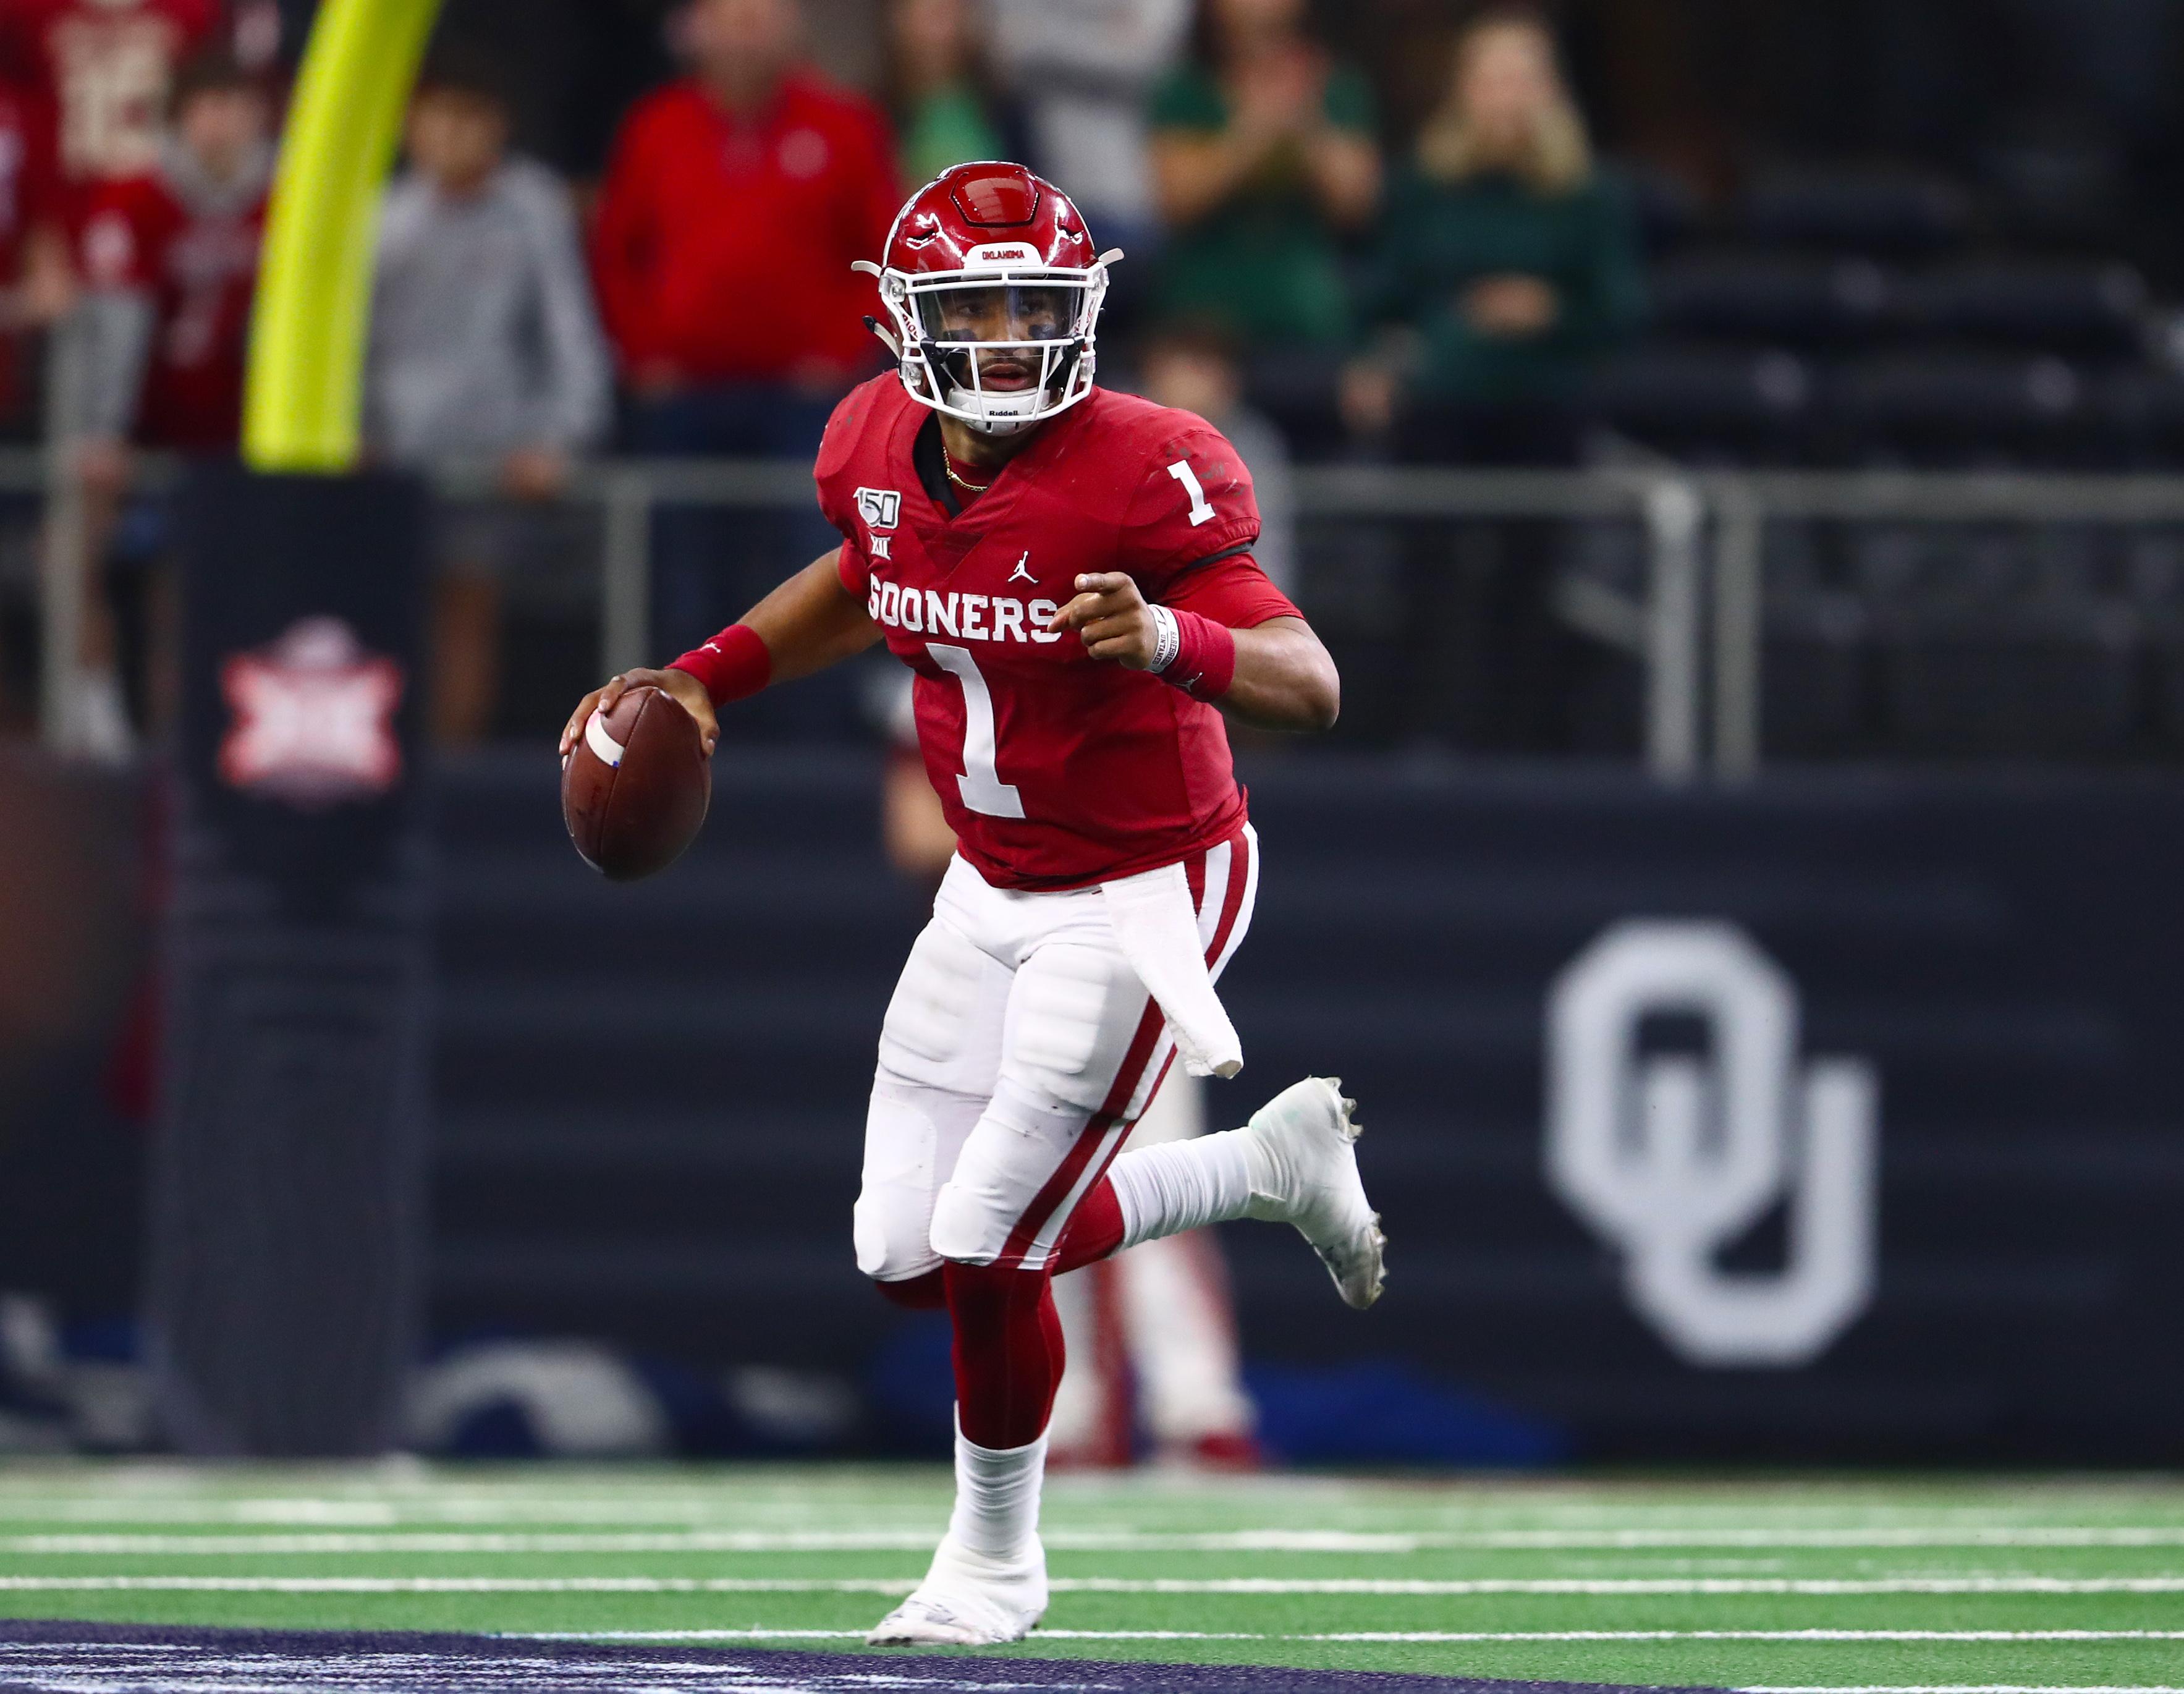 2020 NFL Mock Draft: Chargers, Bucs get their future quarterbacks